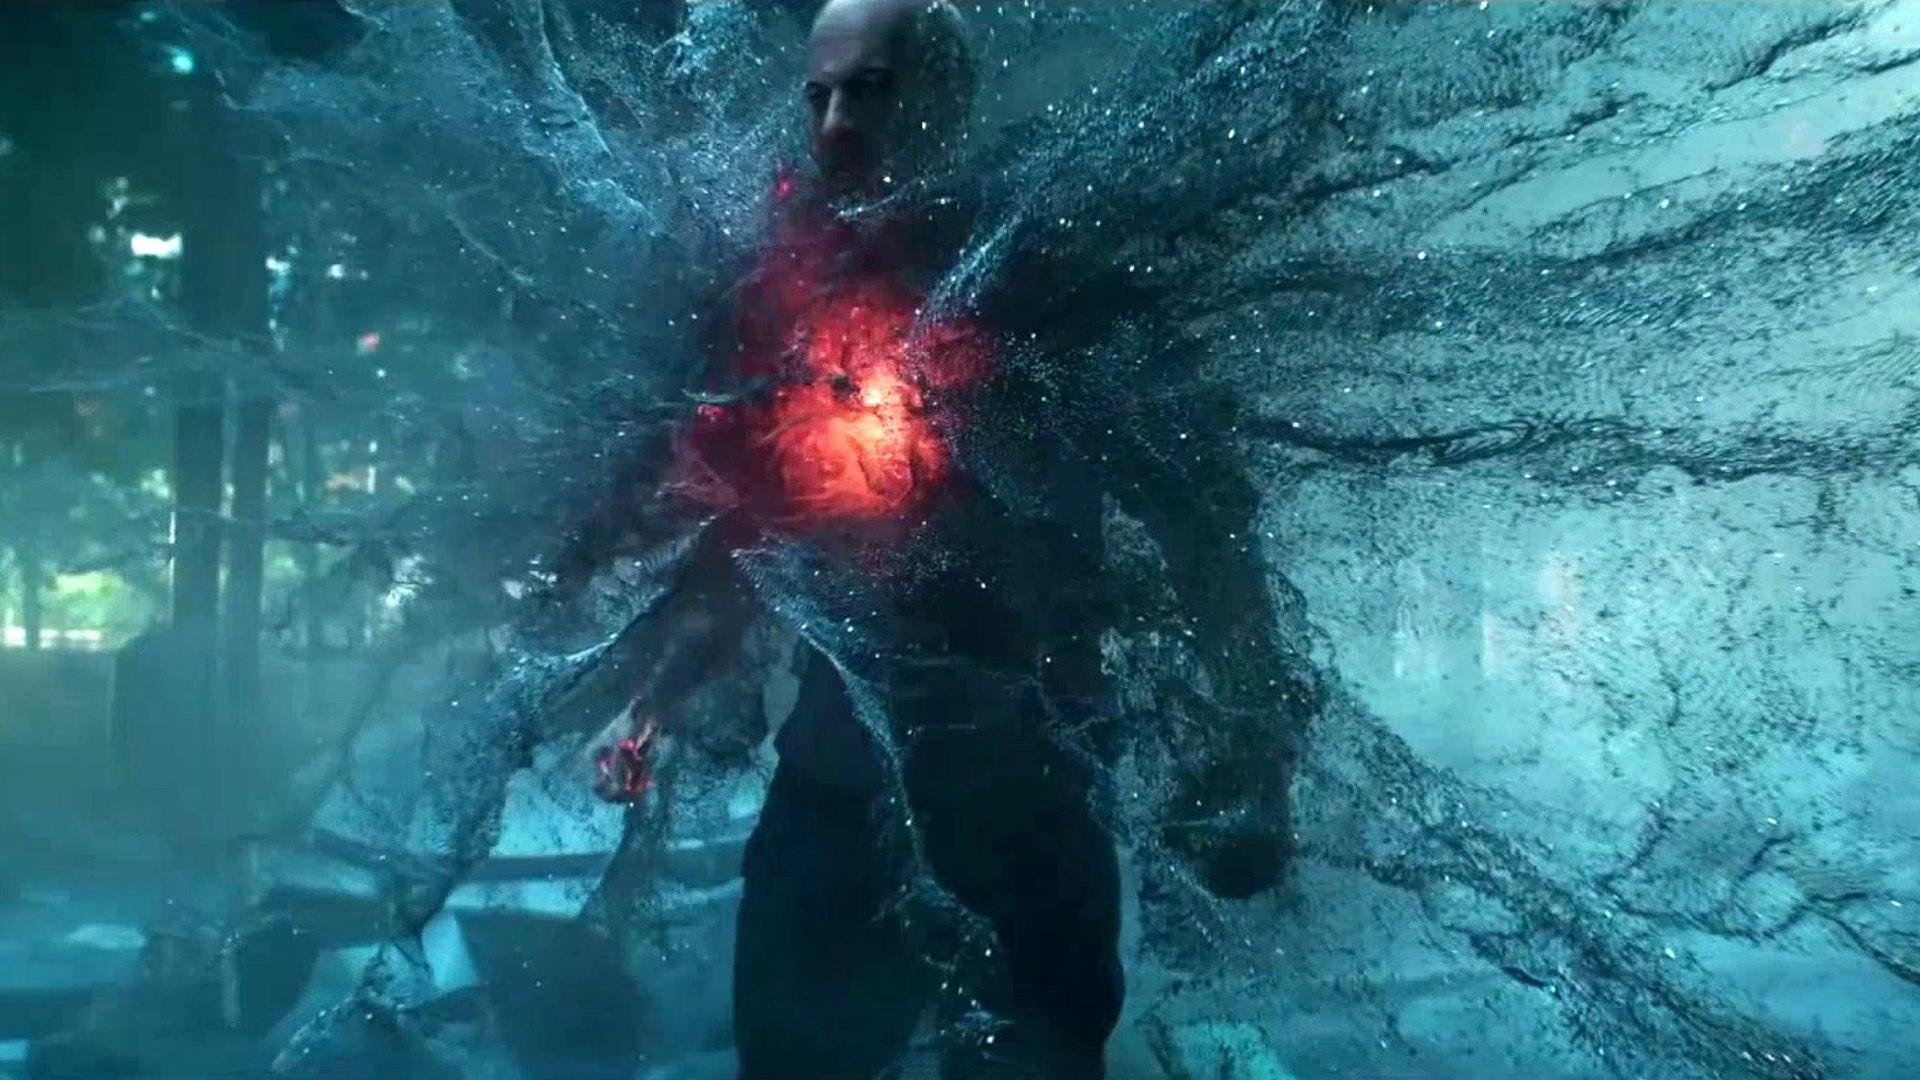 Bloodshot: Beat (French TV Spot)